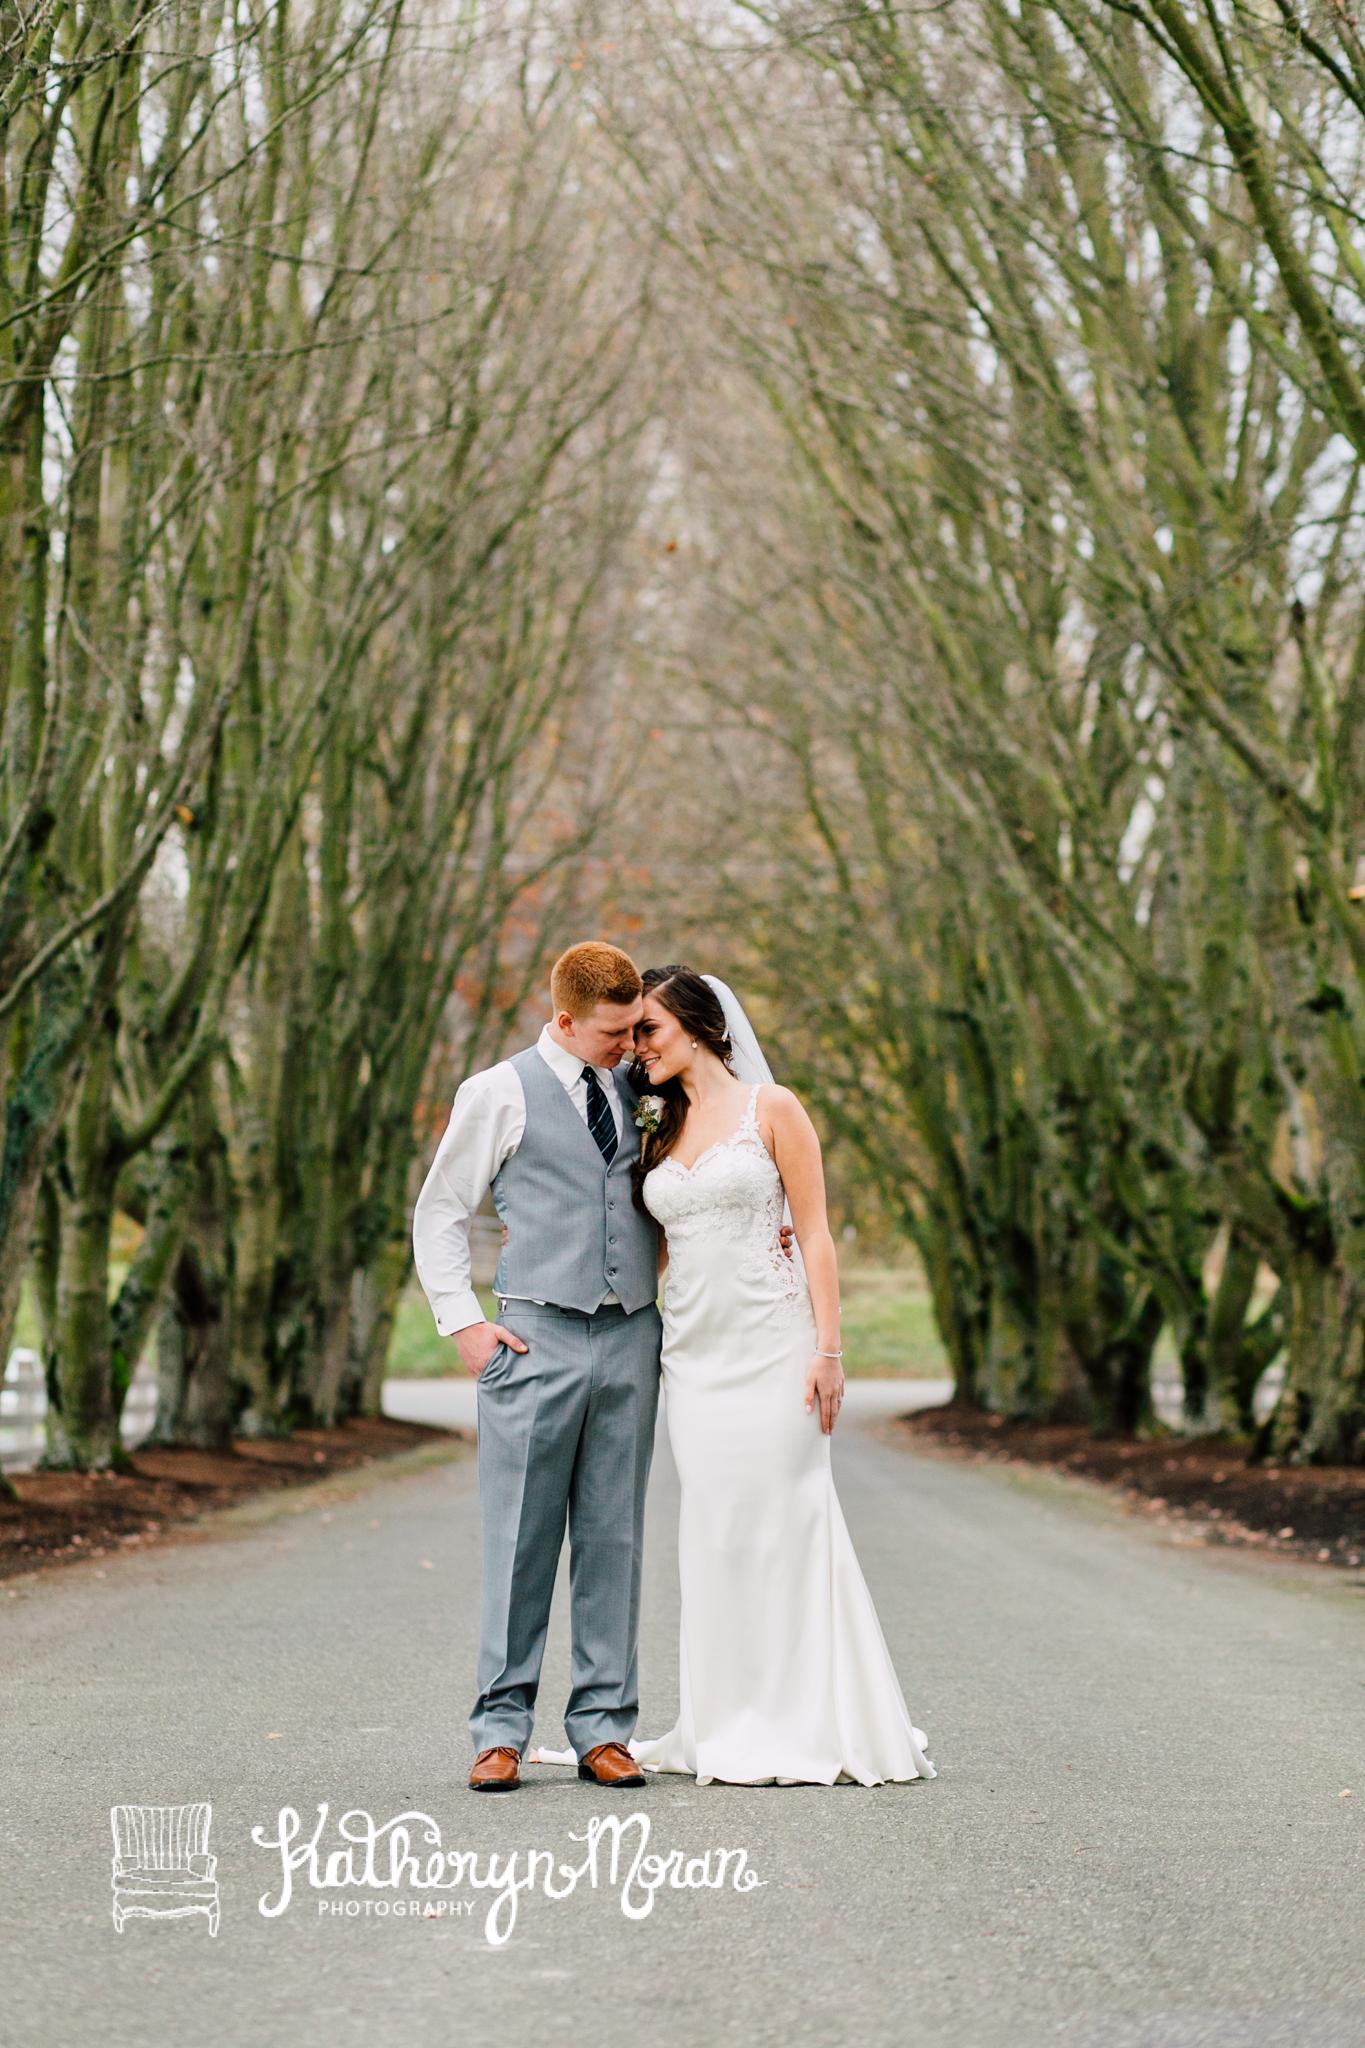 maplehurst-farm-wedding-katheryn-moran-photography-koogle-7.jpg